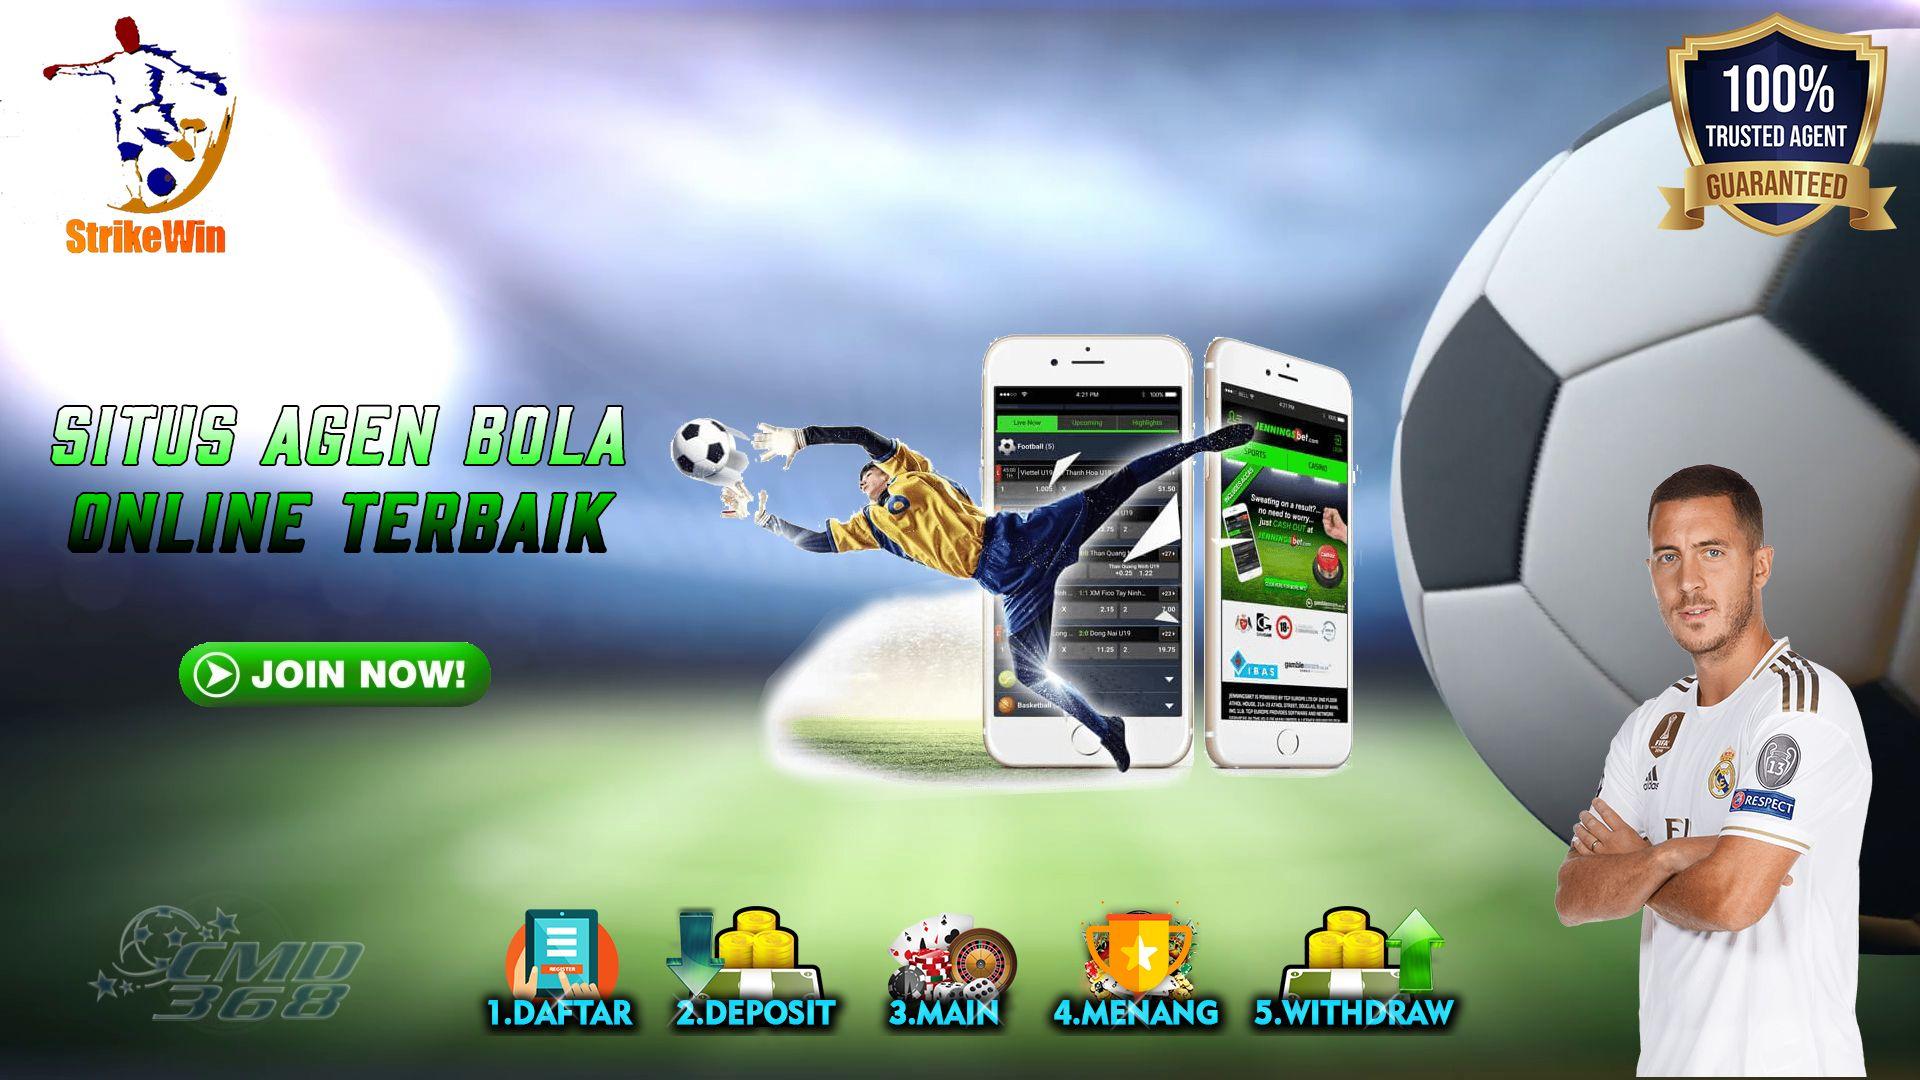 Situs Agen Bola Online Terbaik Dan Terpercaya Online Agen Bandar